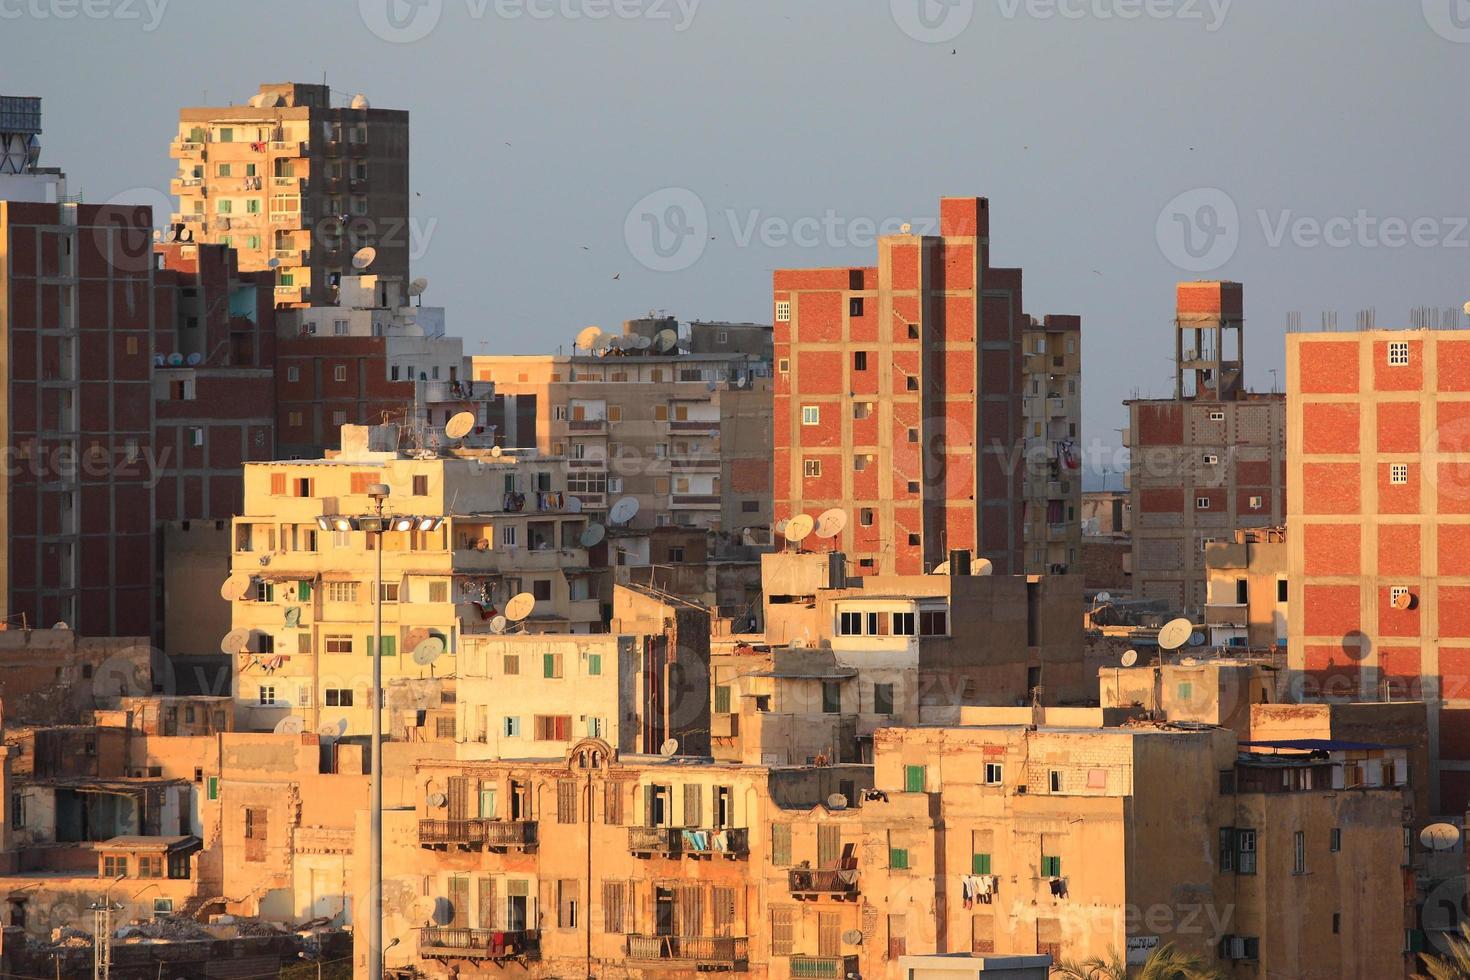 Alexandria slums, Egypt photo